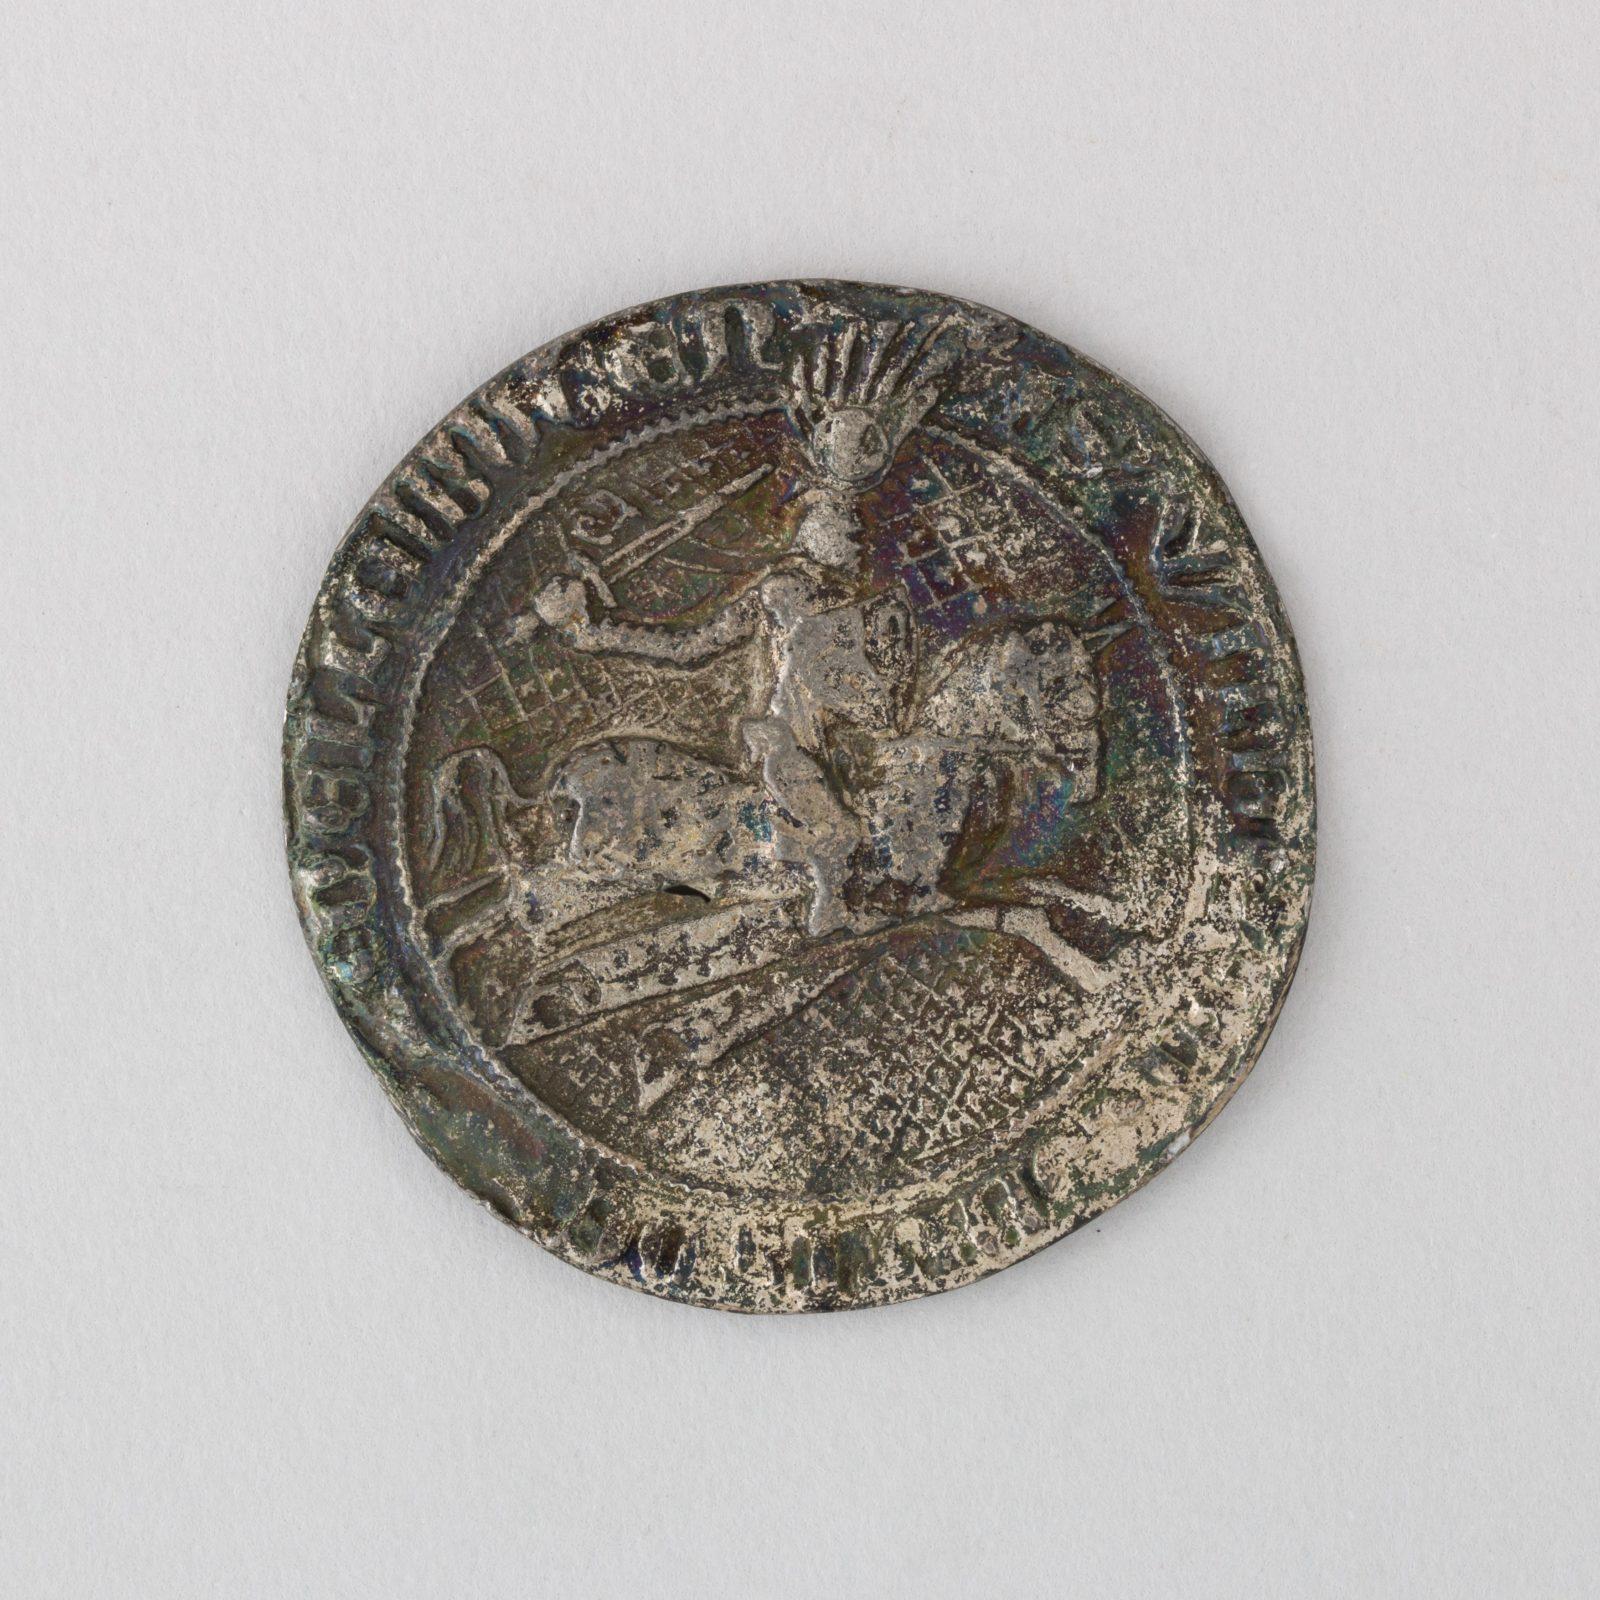 Reproduction of the Seal of Wilhelm, Graf von Catzenelnbogen, L. 12th–14th century